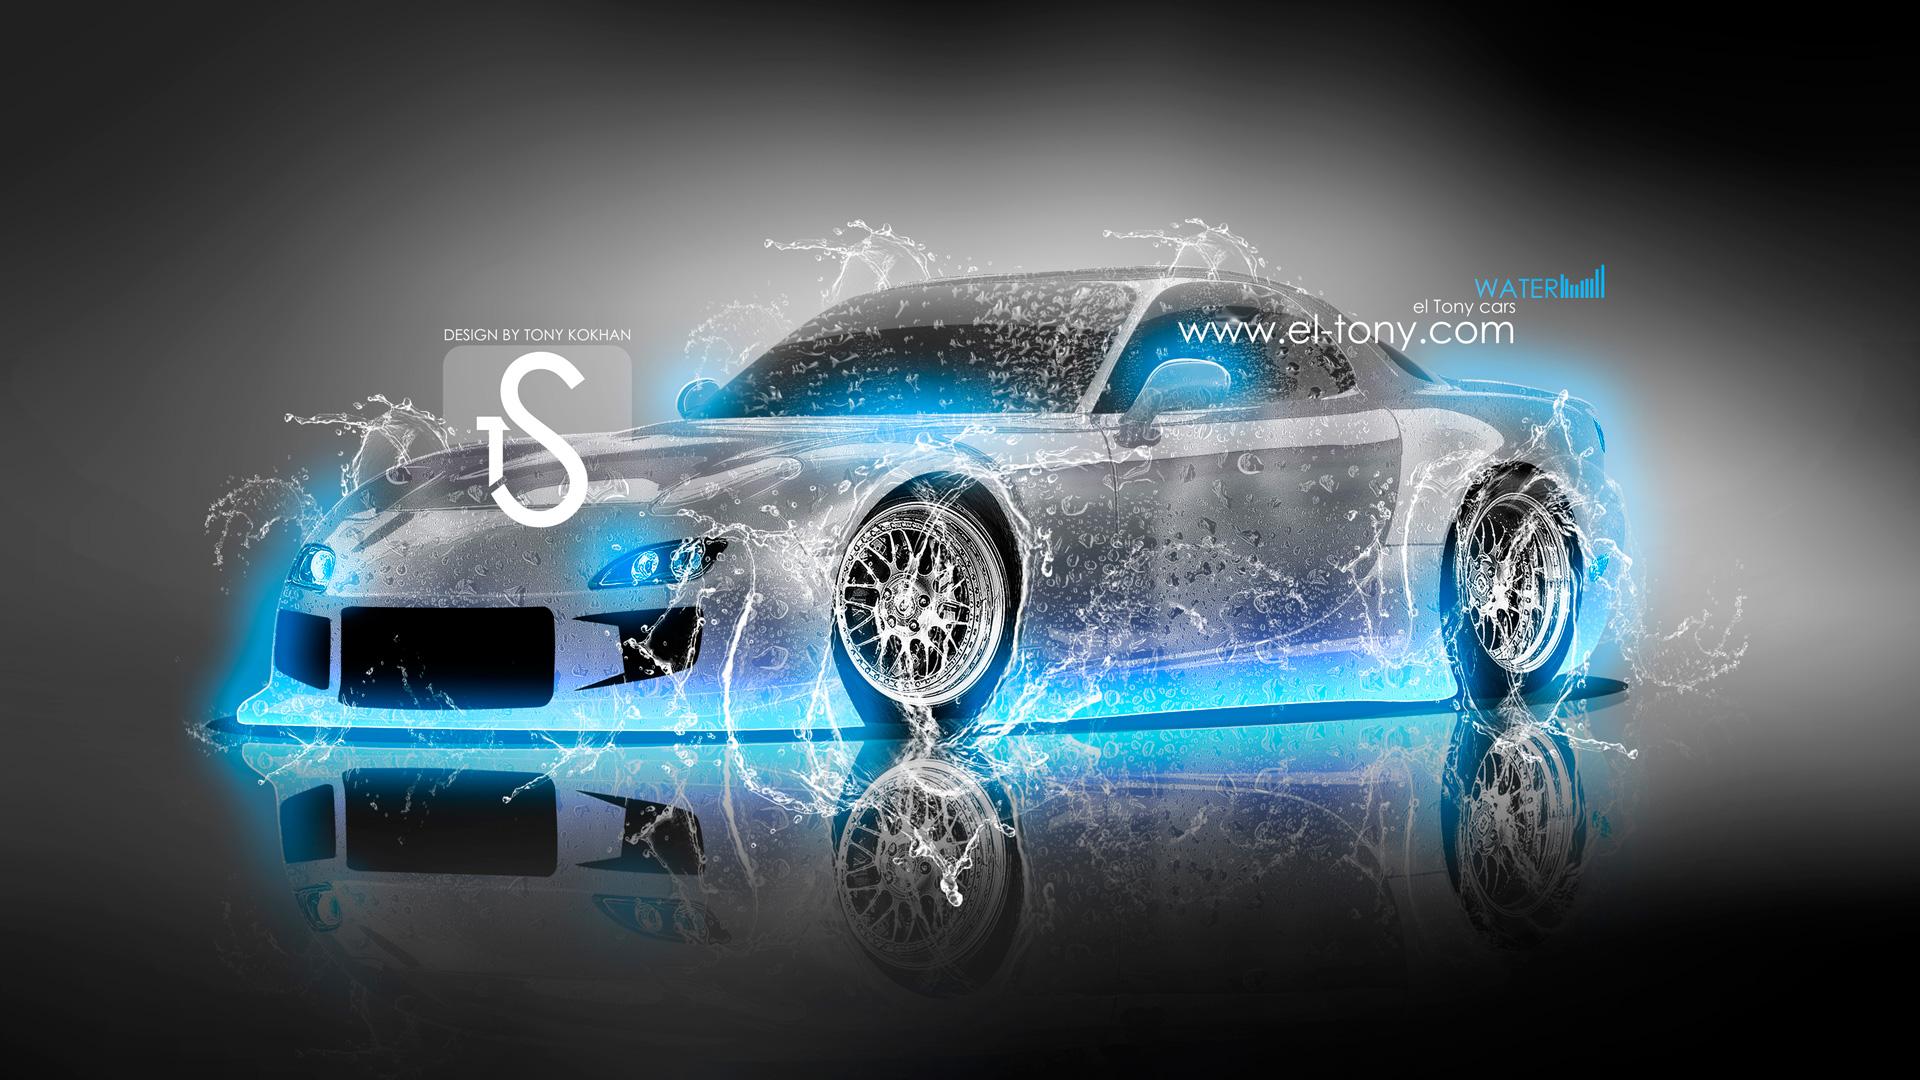 4k Mazda Rx8 Jdm Tuning Back Smoke Car 2015 Mazda Rx7 Jdm Back Water  1920x1080